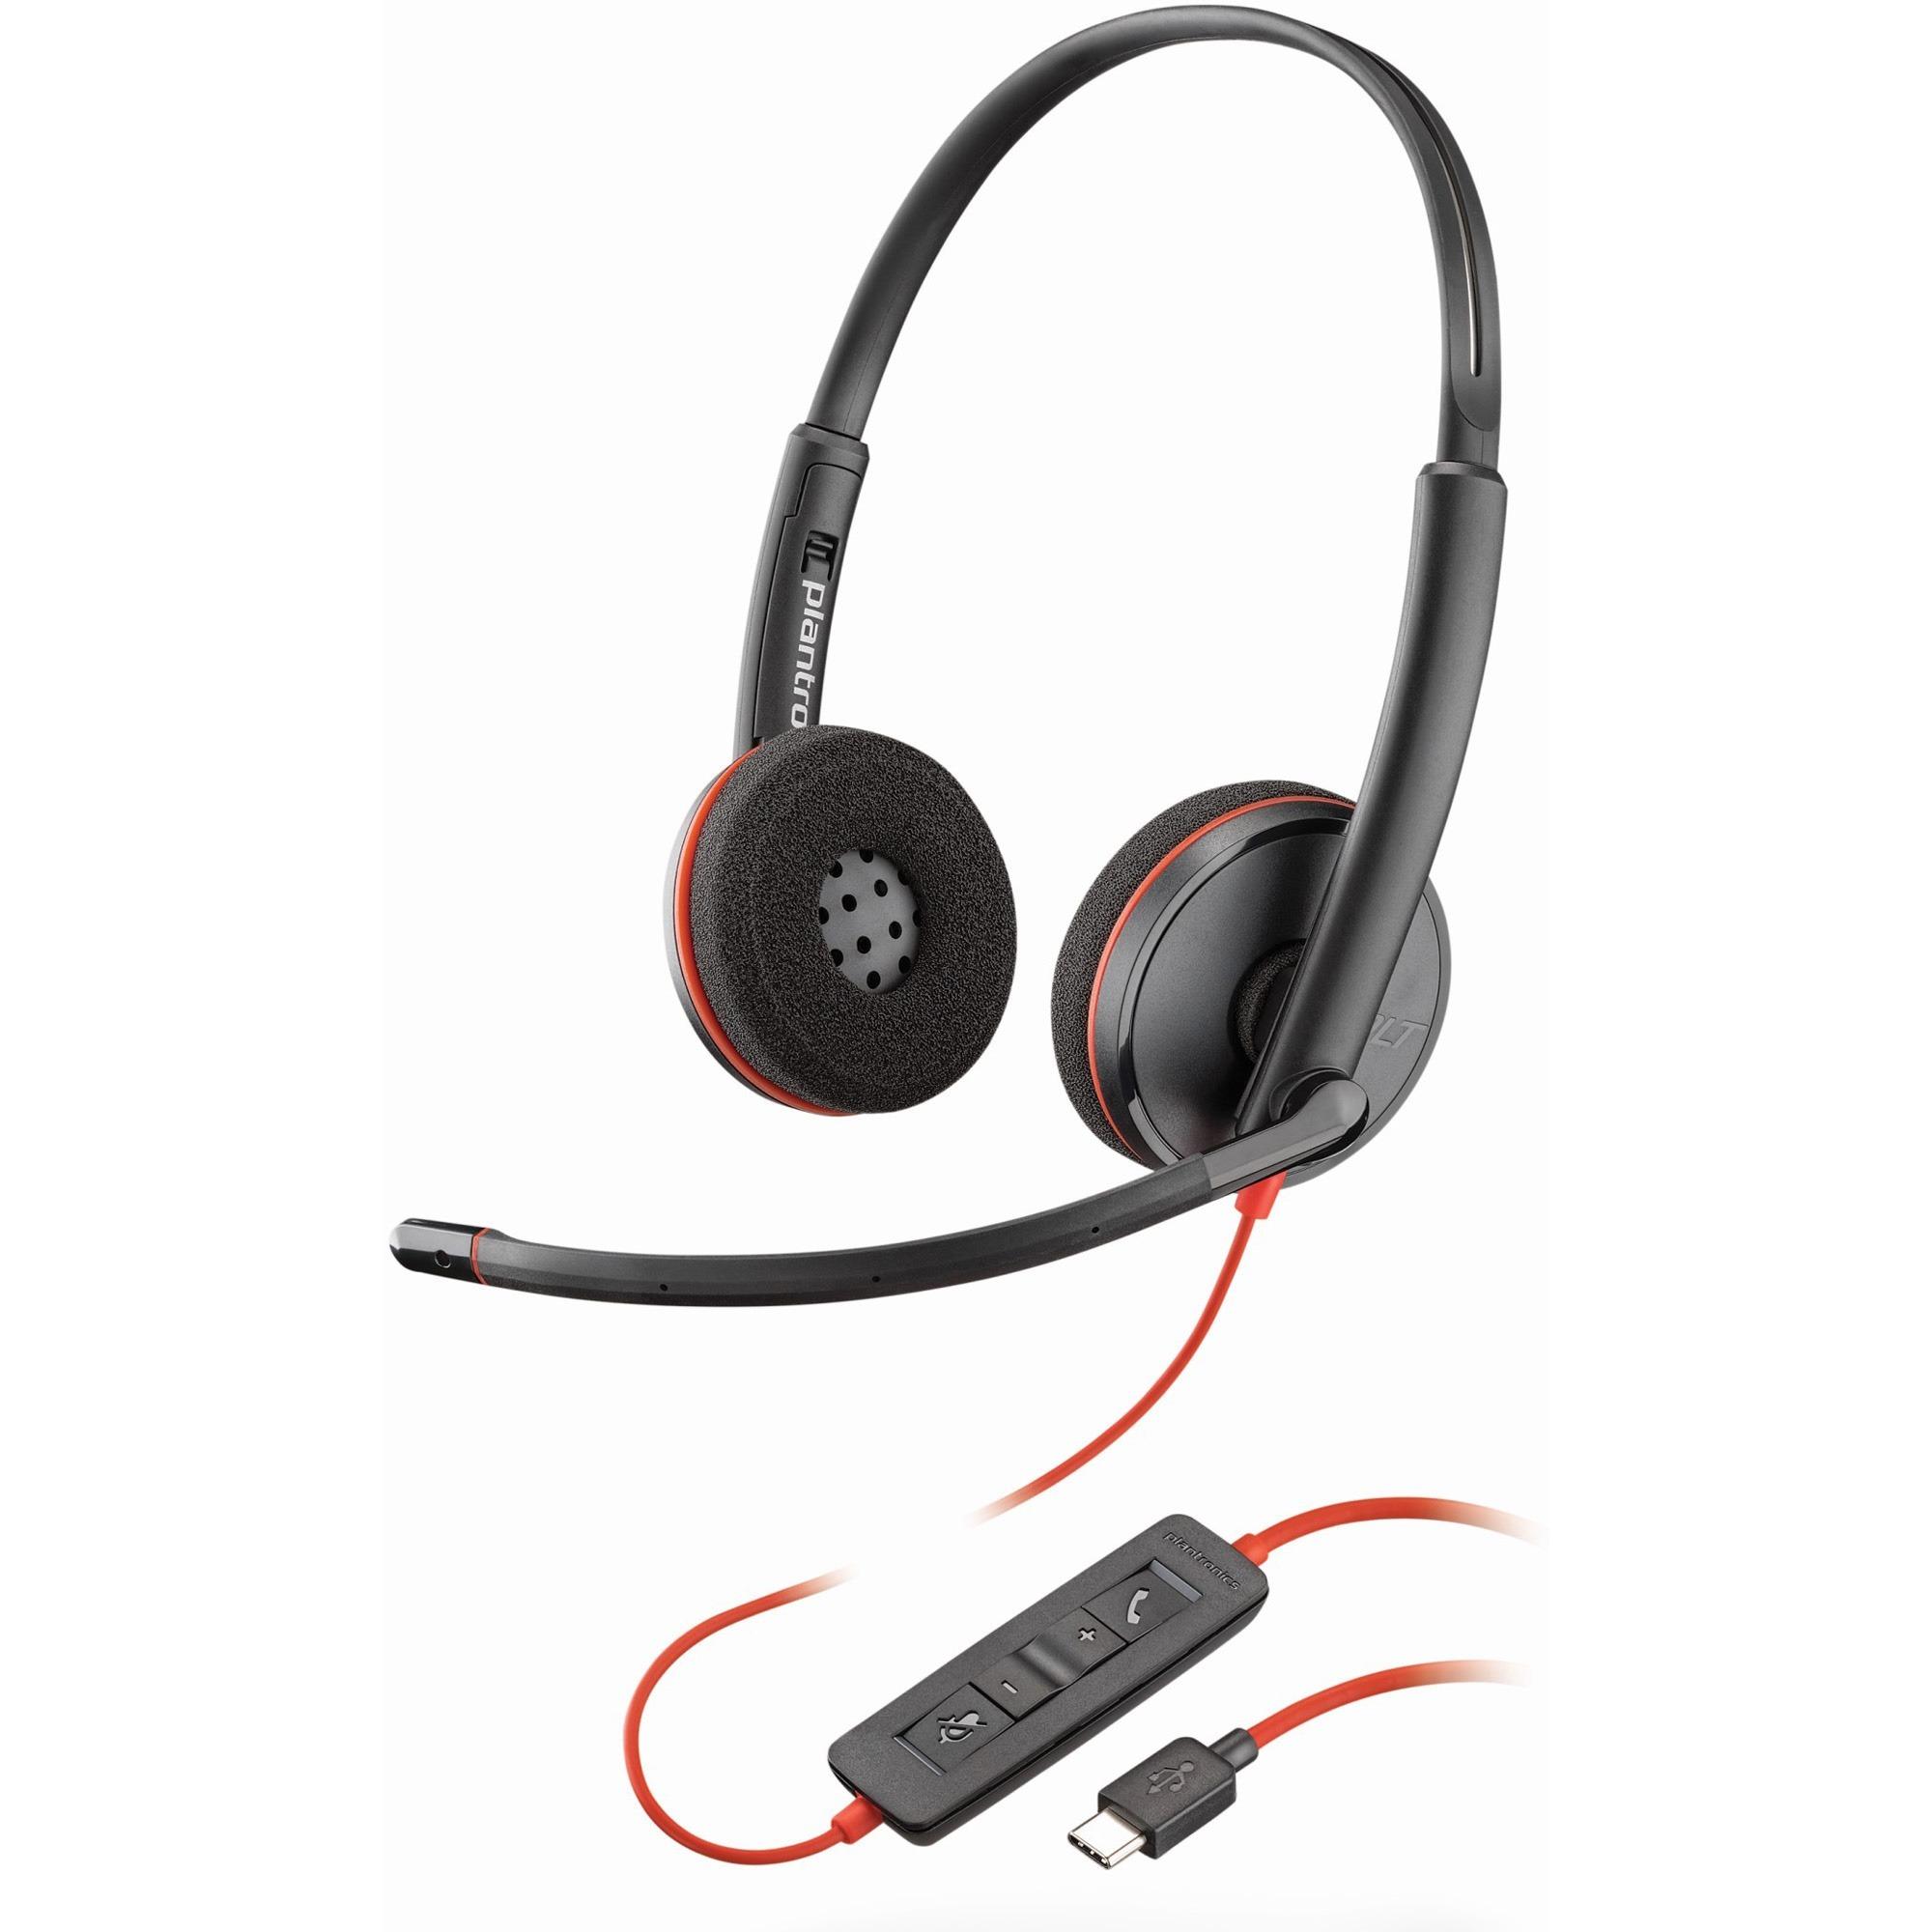 Plantronics USB Binaural Headset_subImage_1